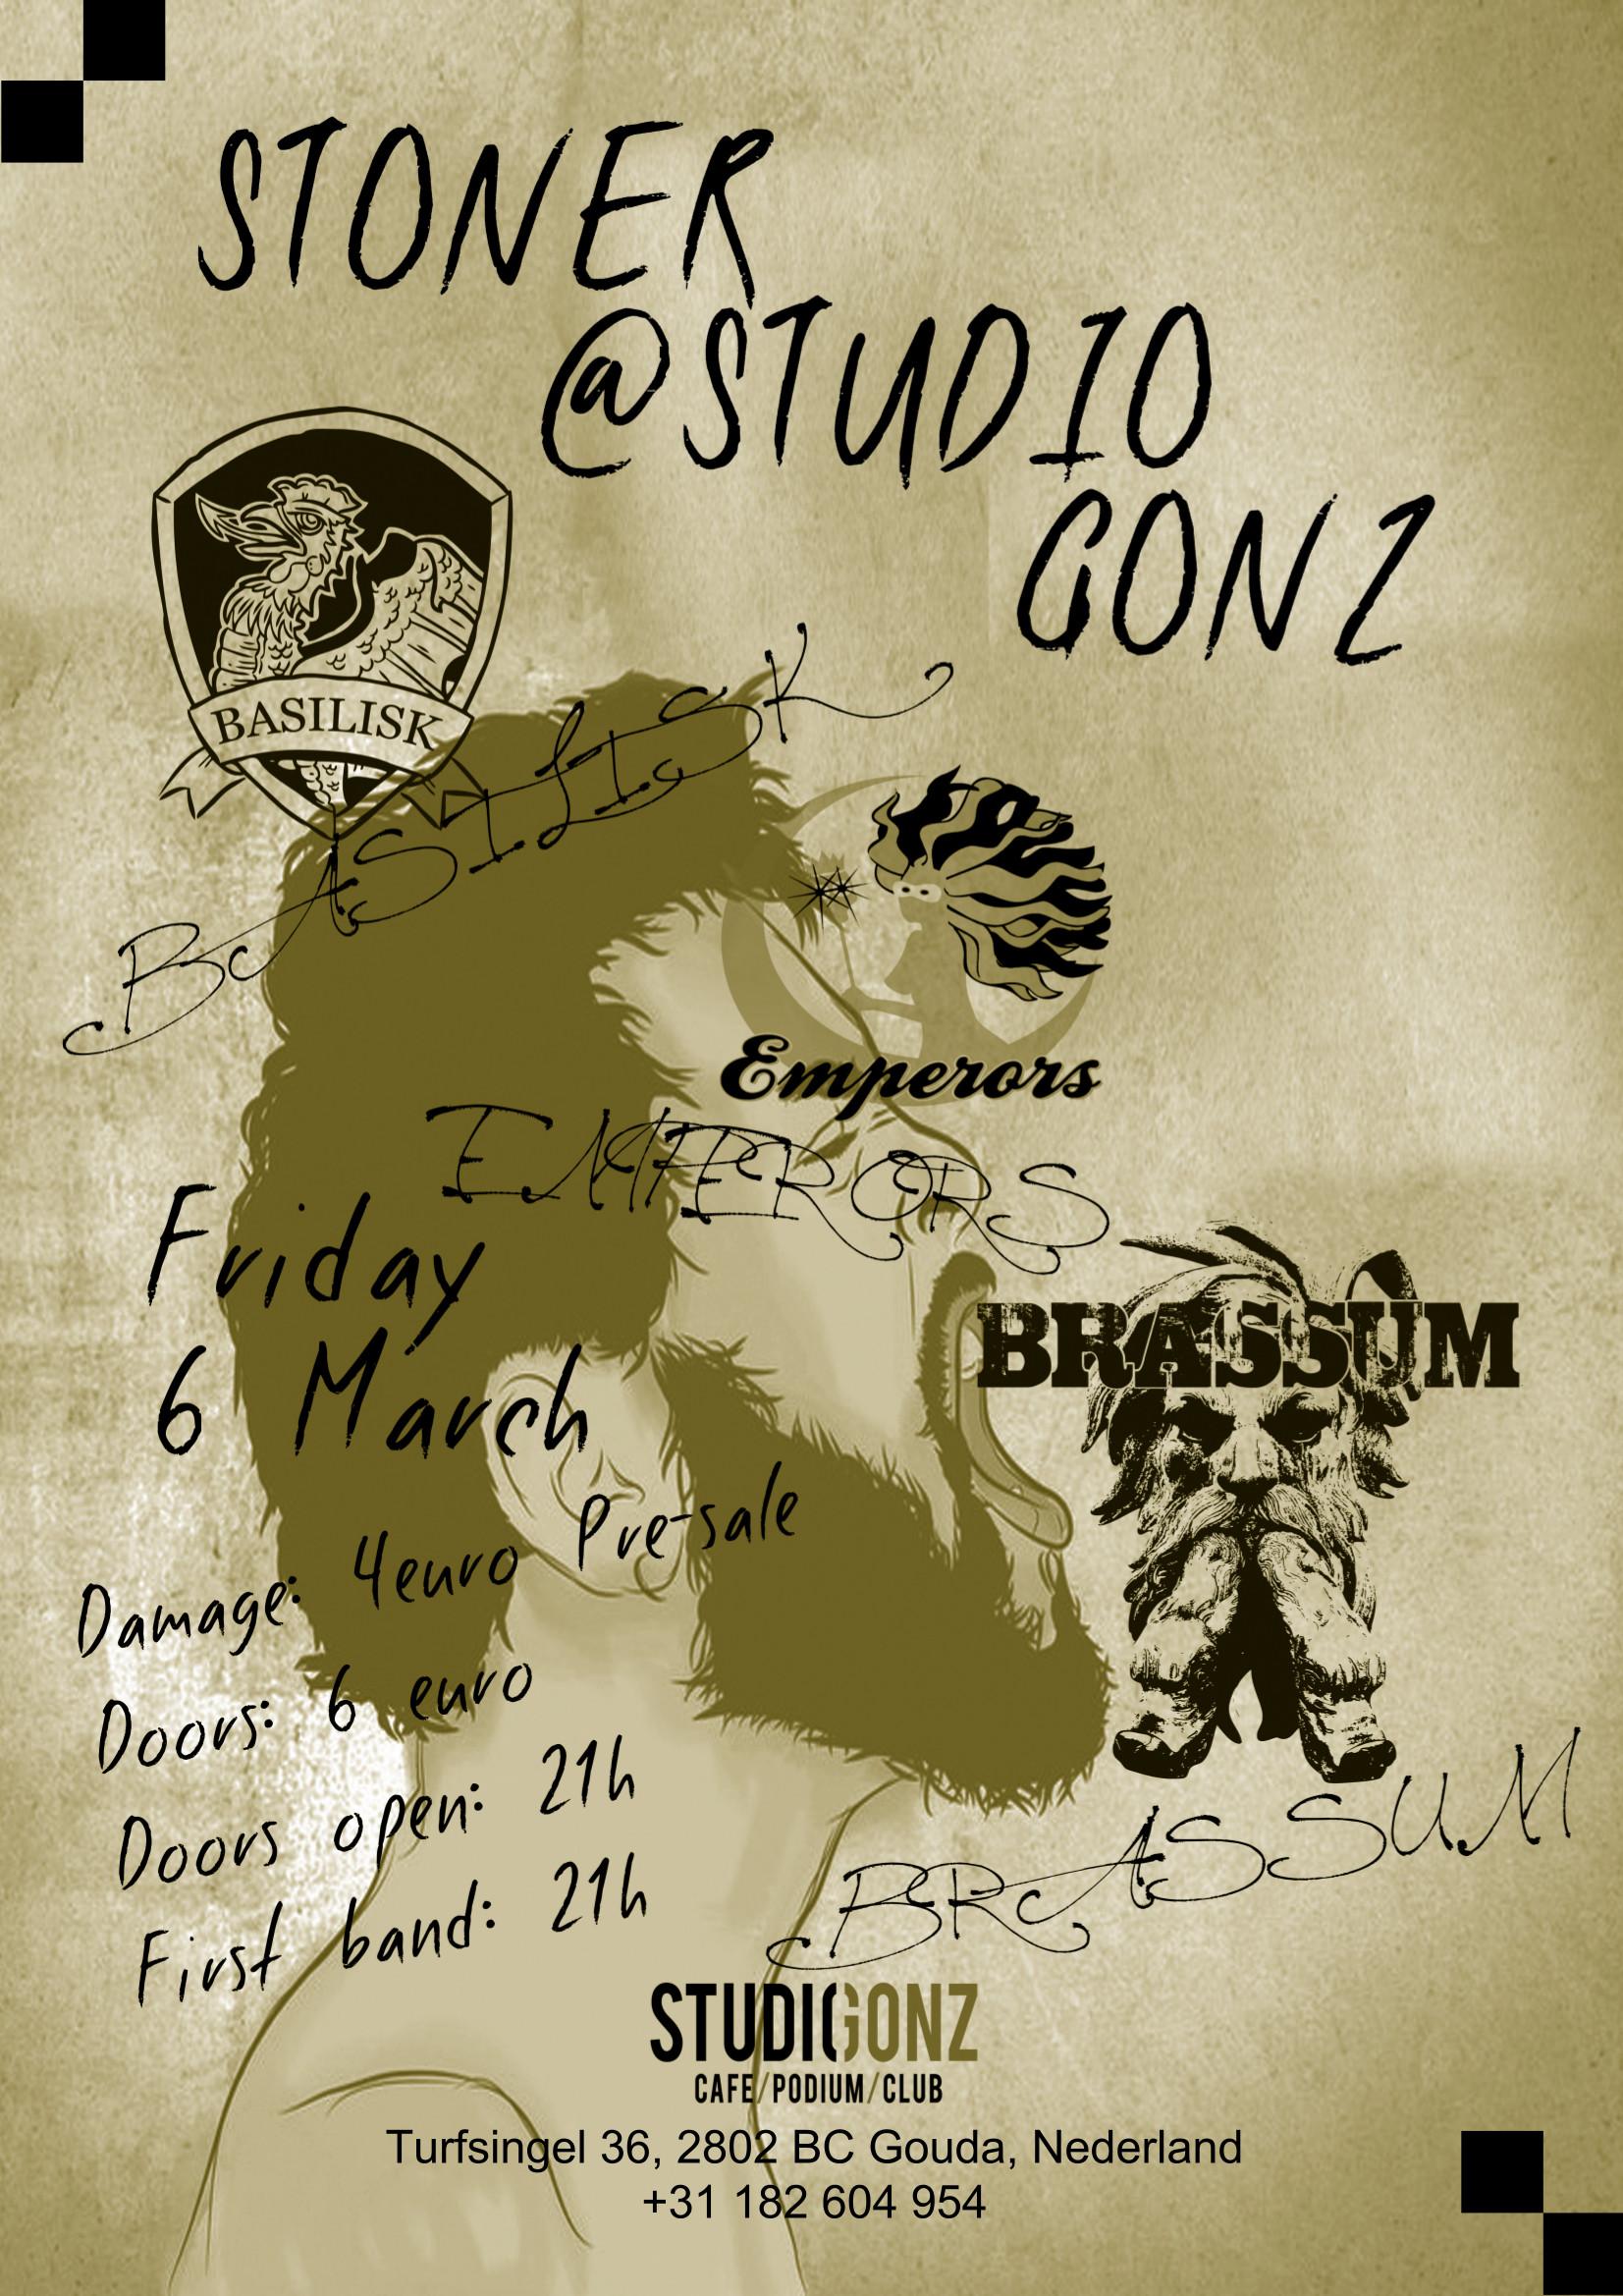 Uitgaan in Gouda: Stoner rock in StudioGonz